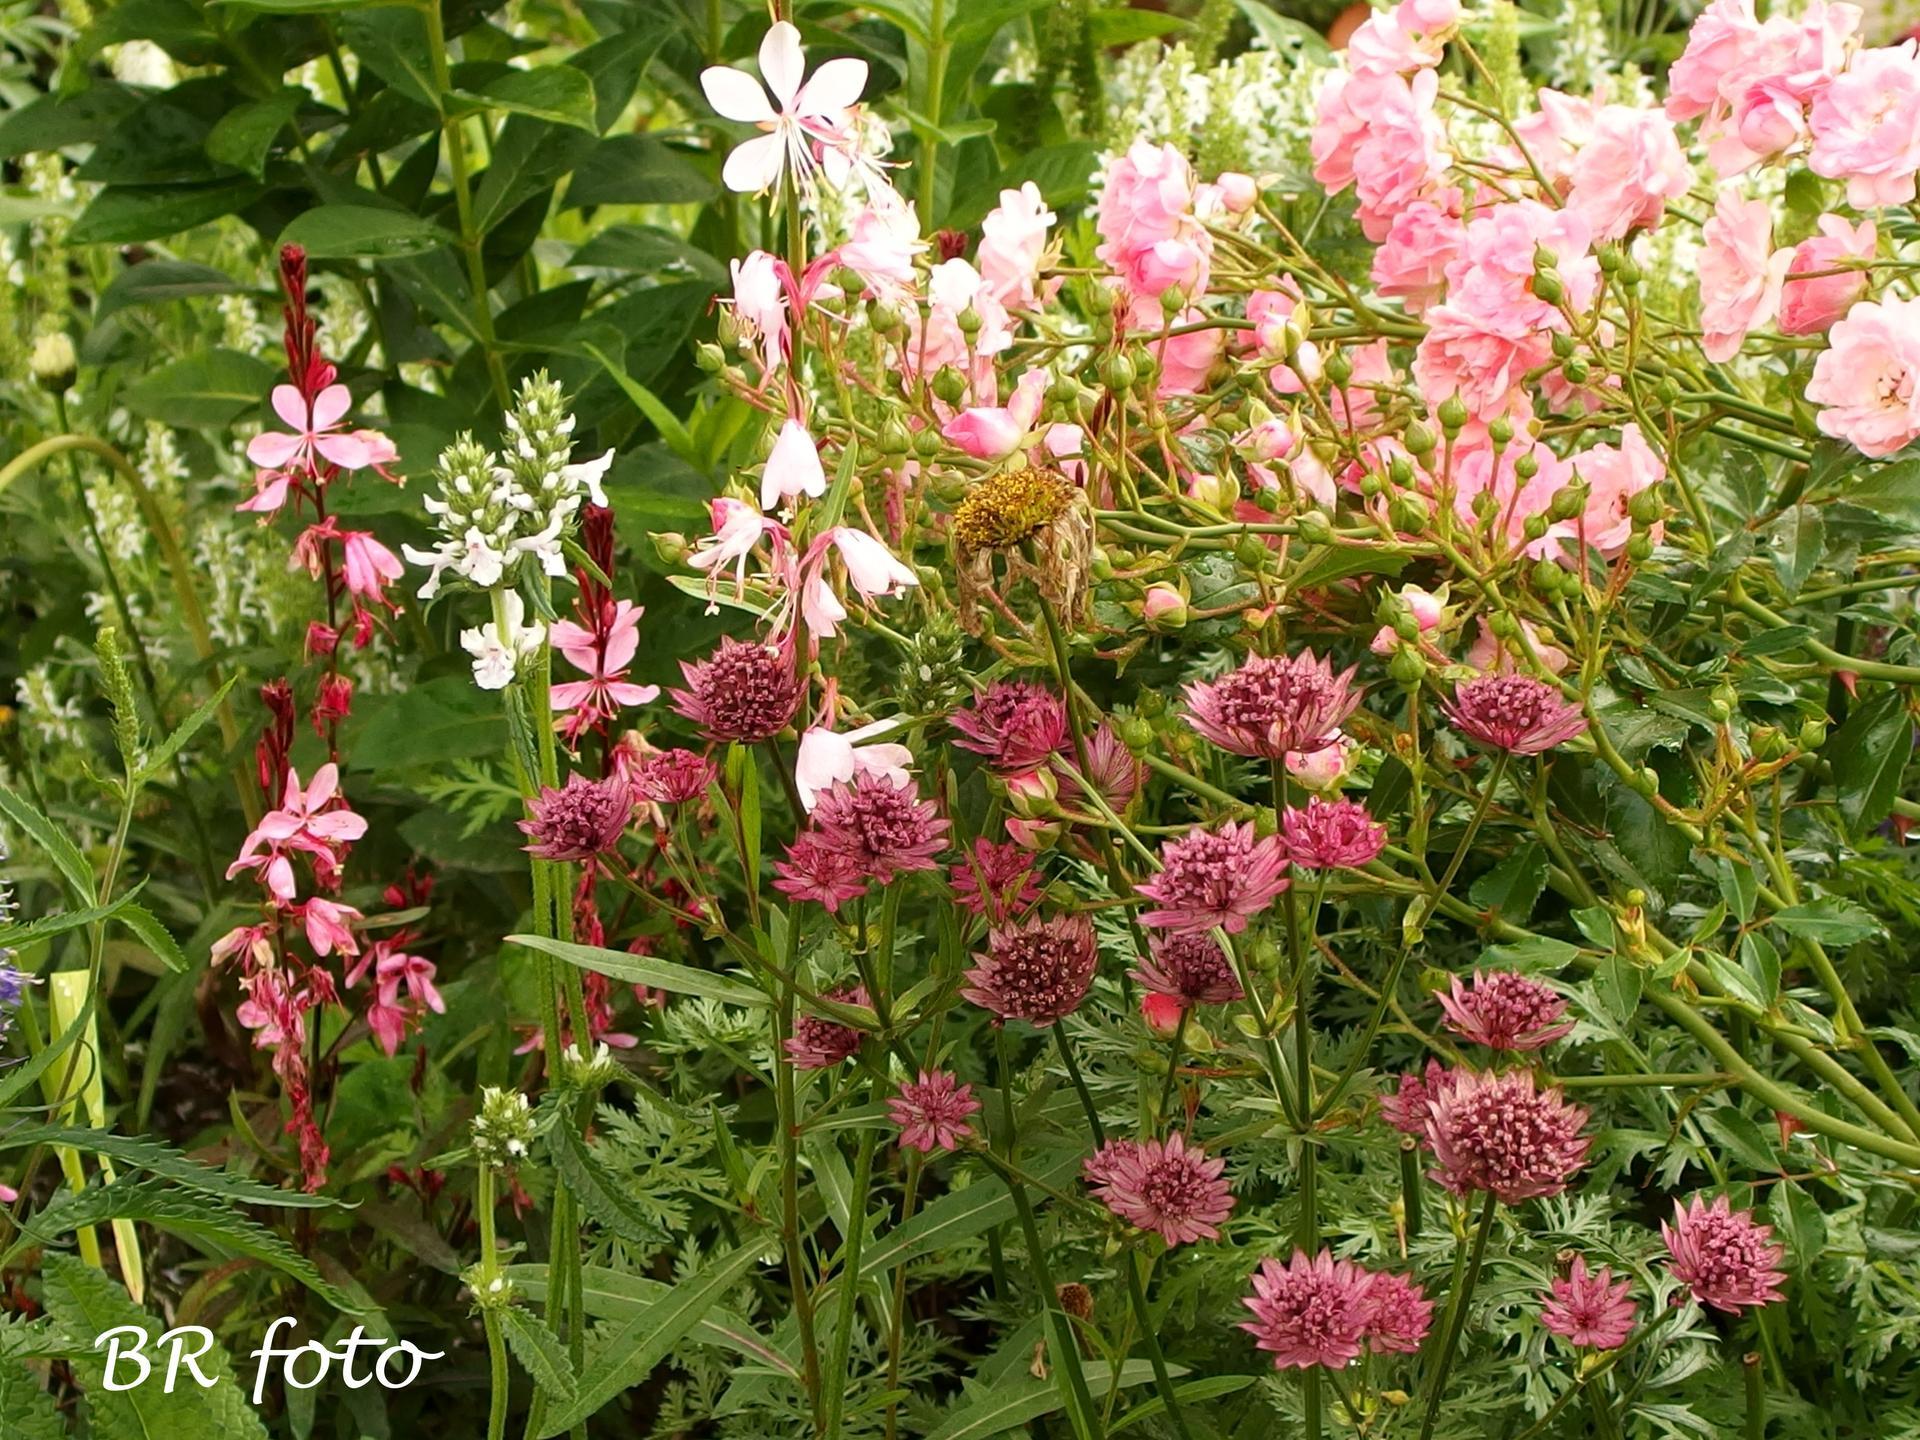 Zahrada v červnu - vše roste a kvete jako o život.... - růžová jarmanka, svíčkovec